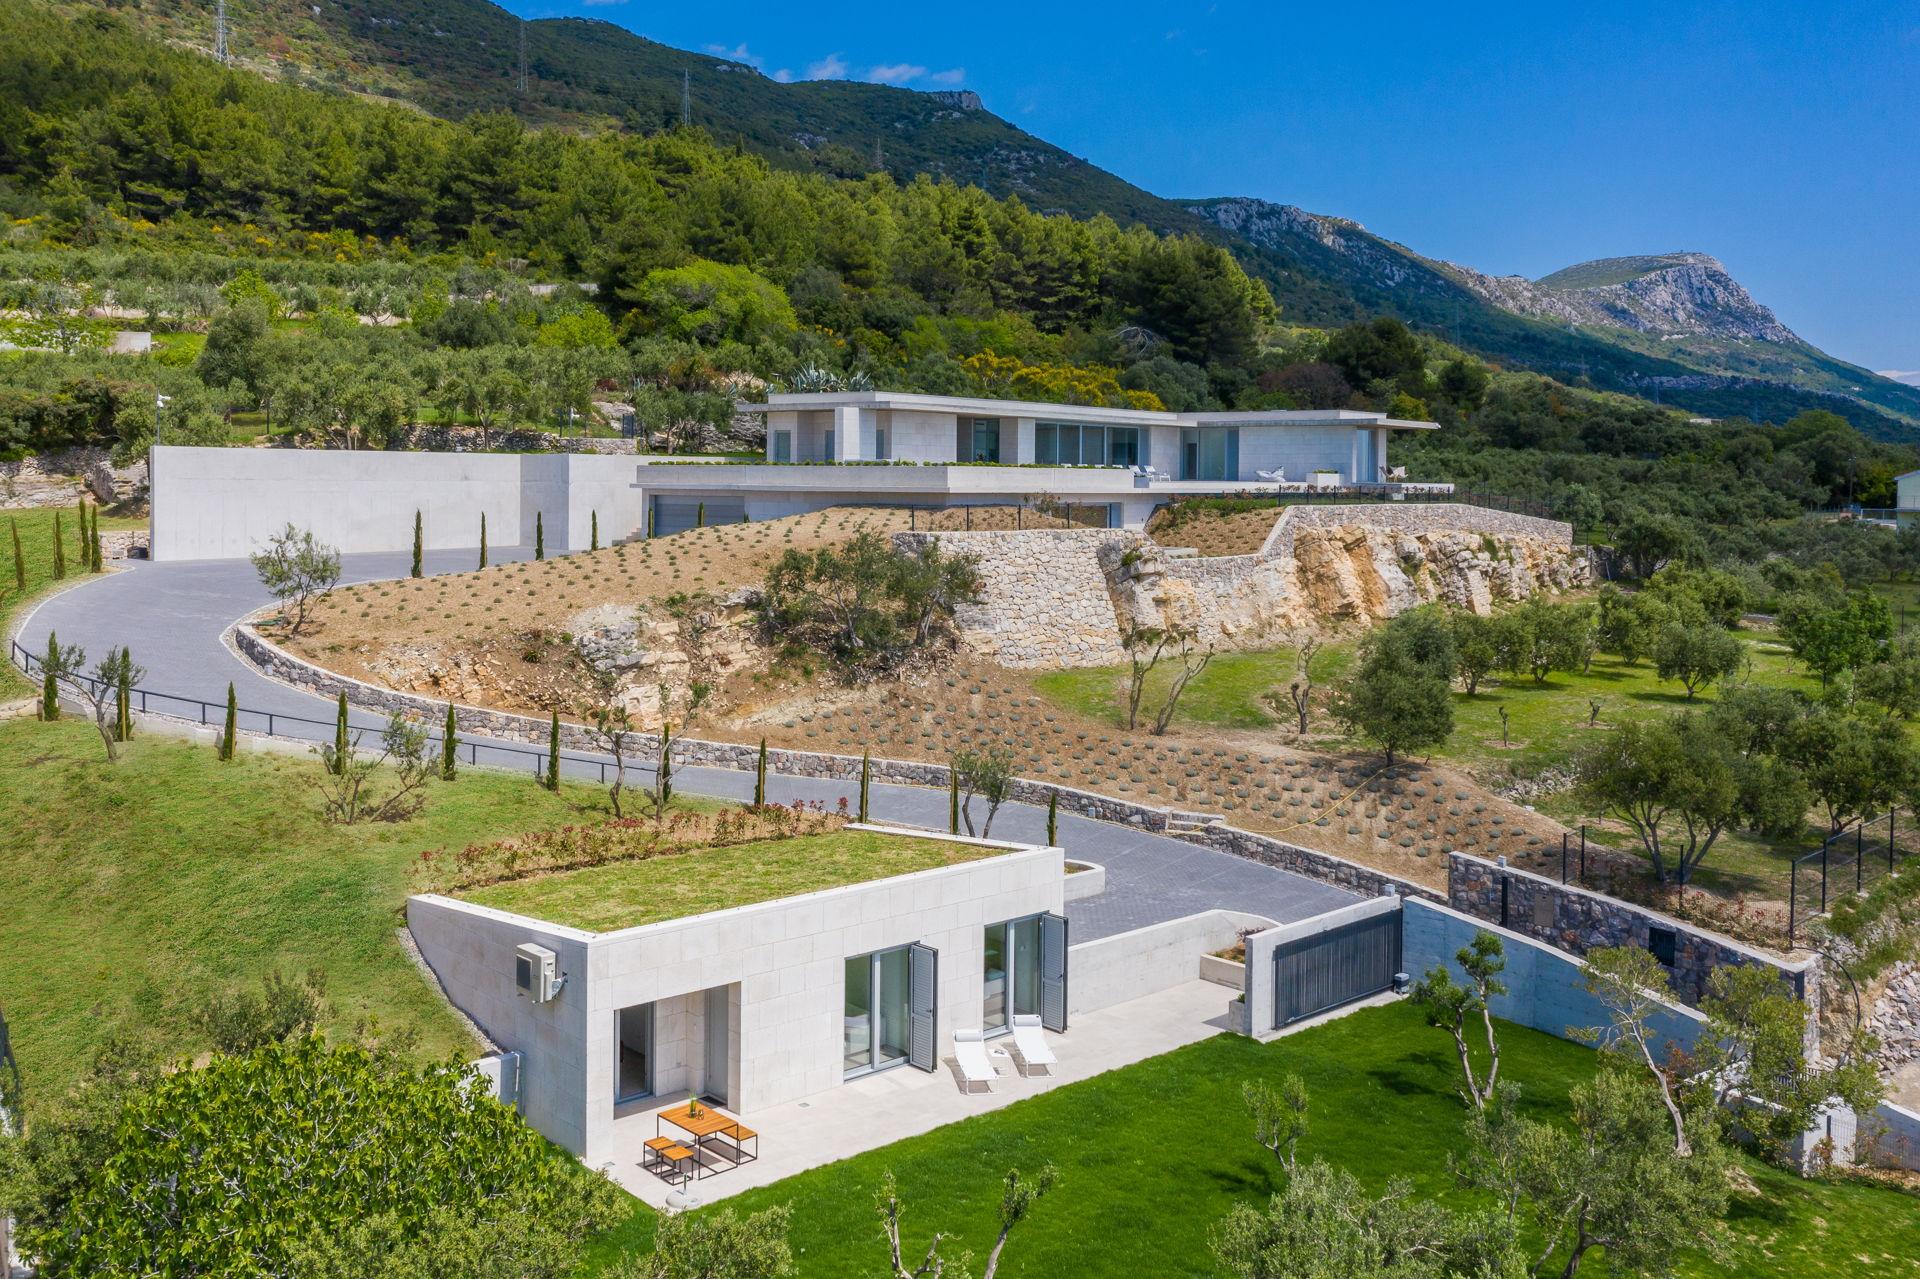 Villa Radun Home Split with separate apartment